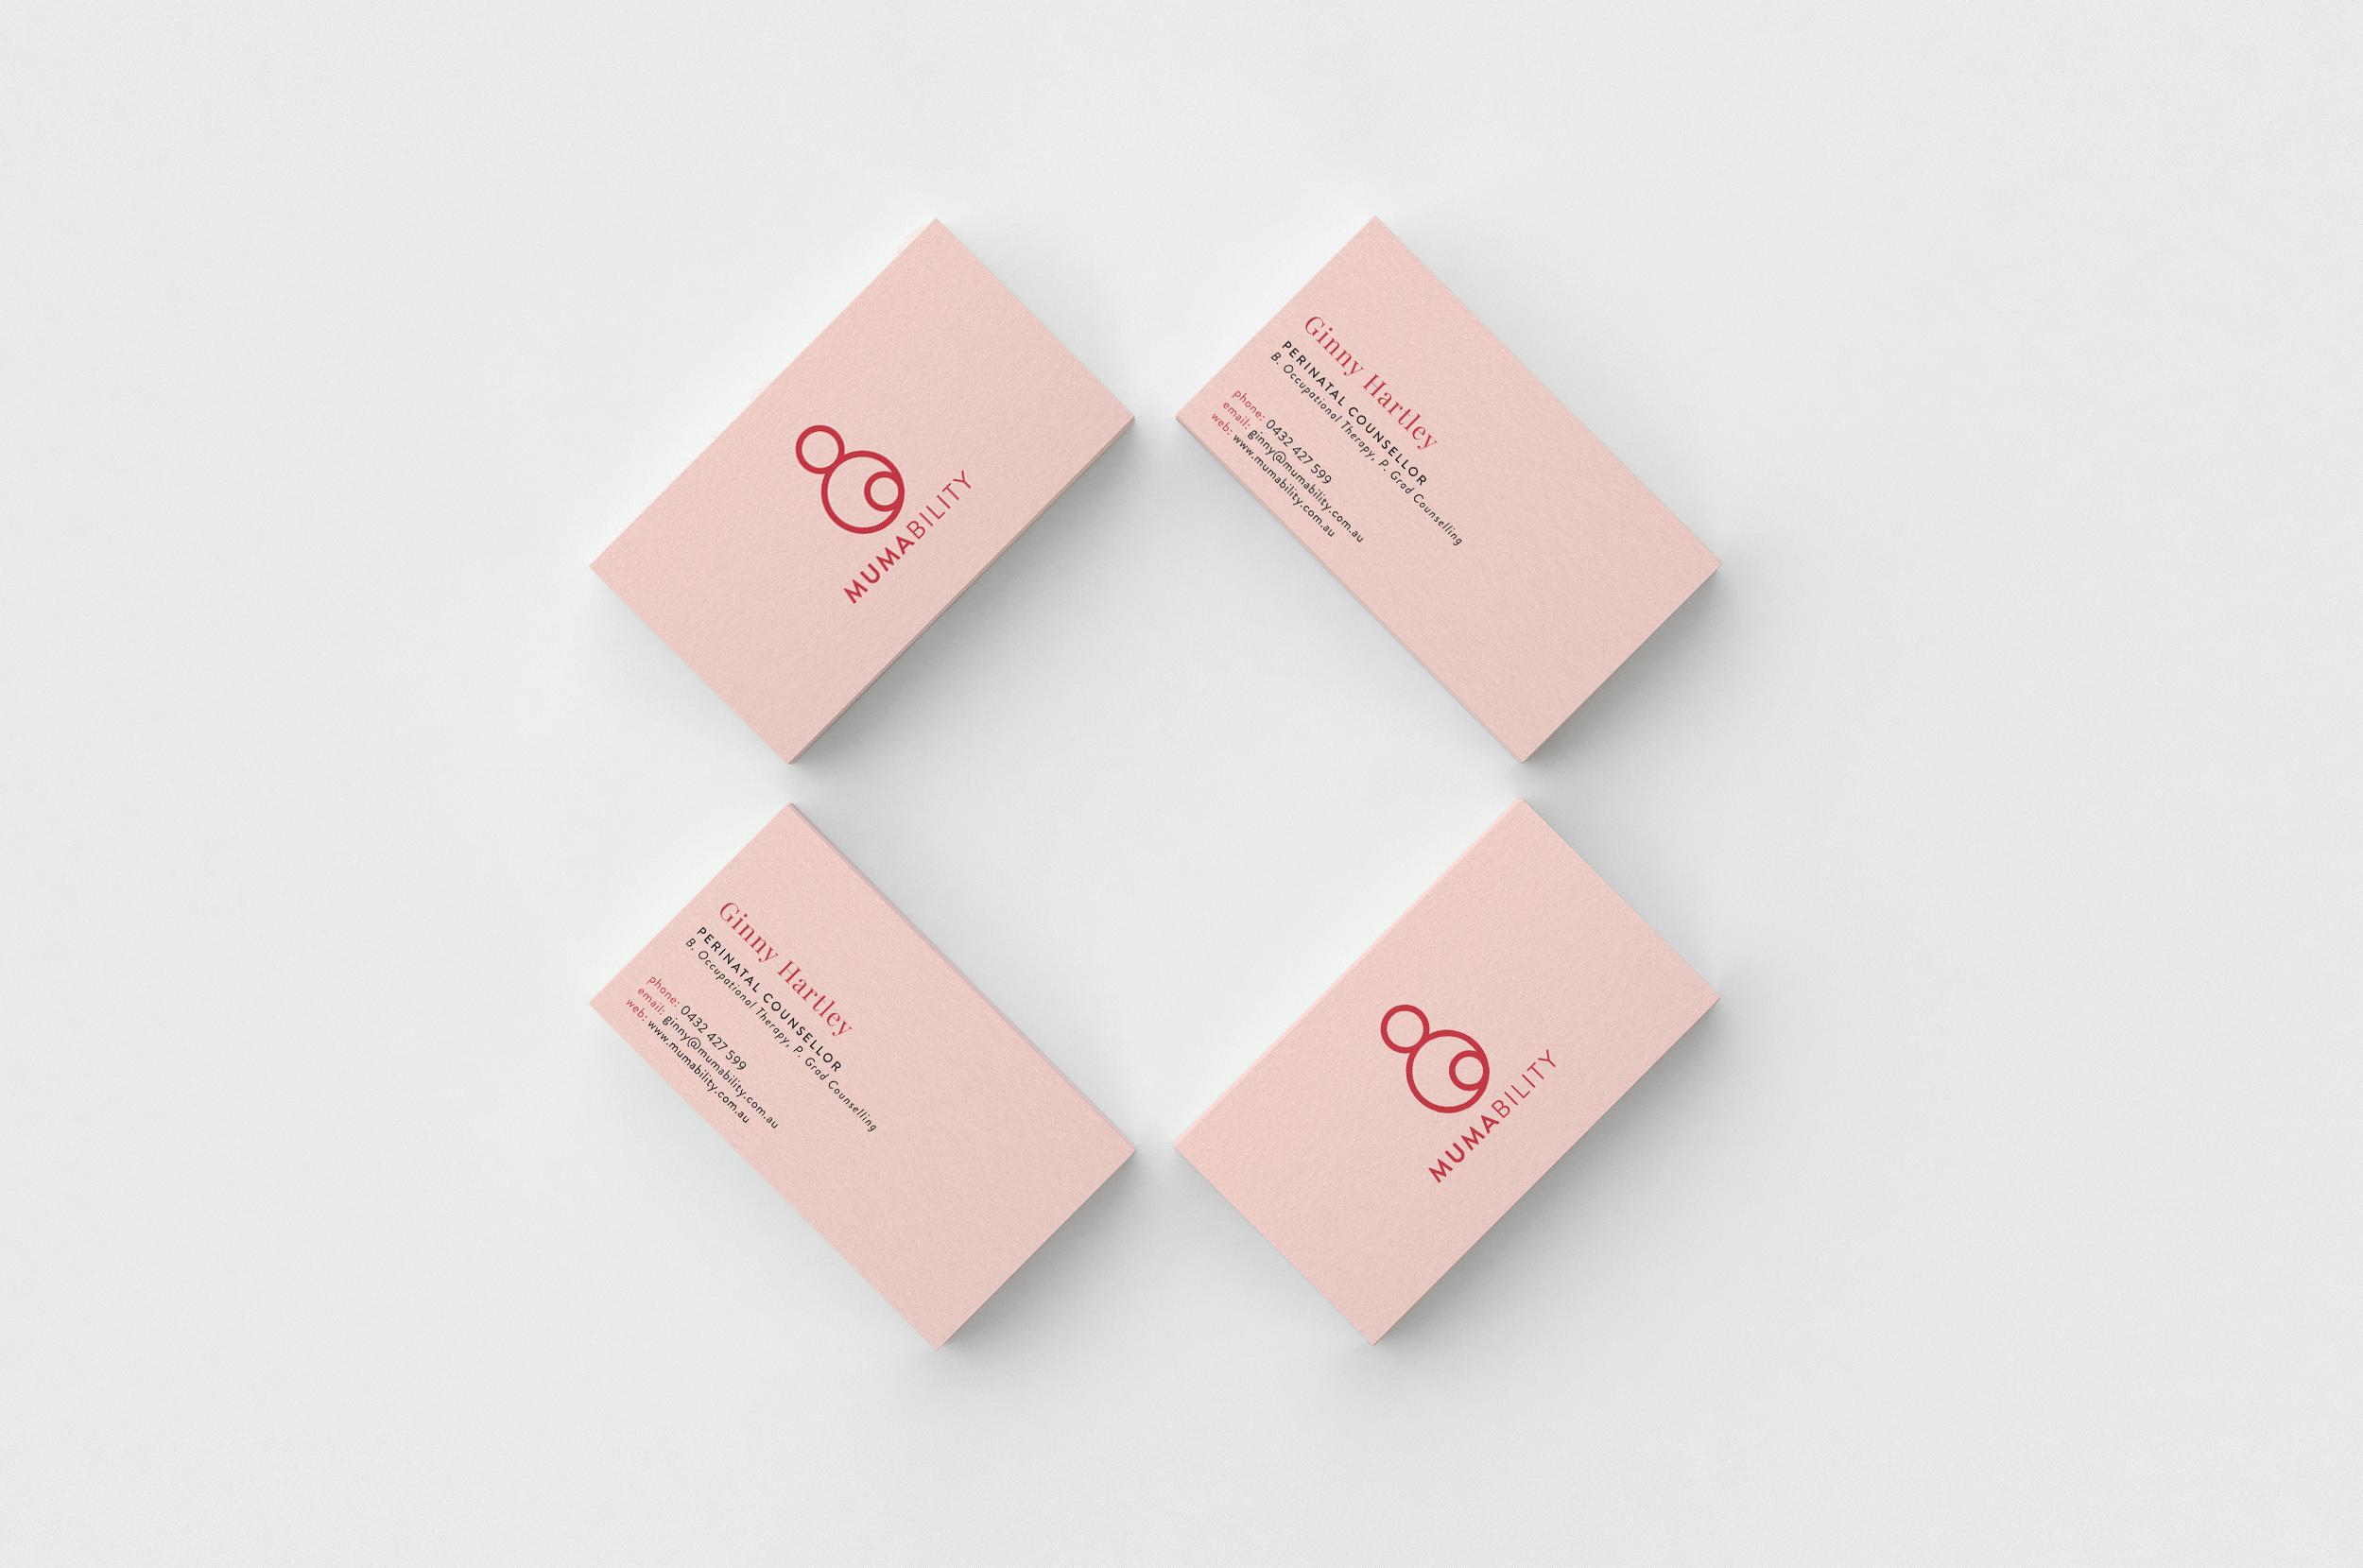 branding-squarespace-web-desgin-melbourne-mumability.png